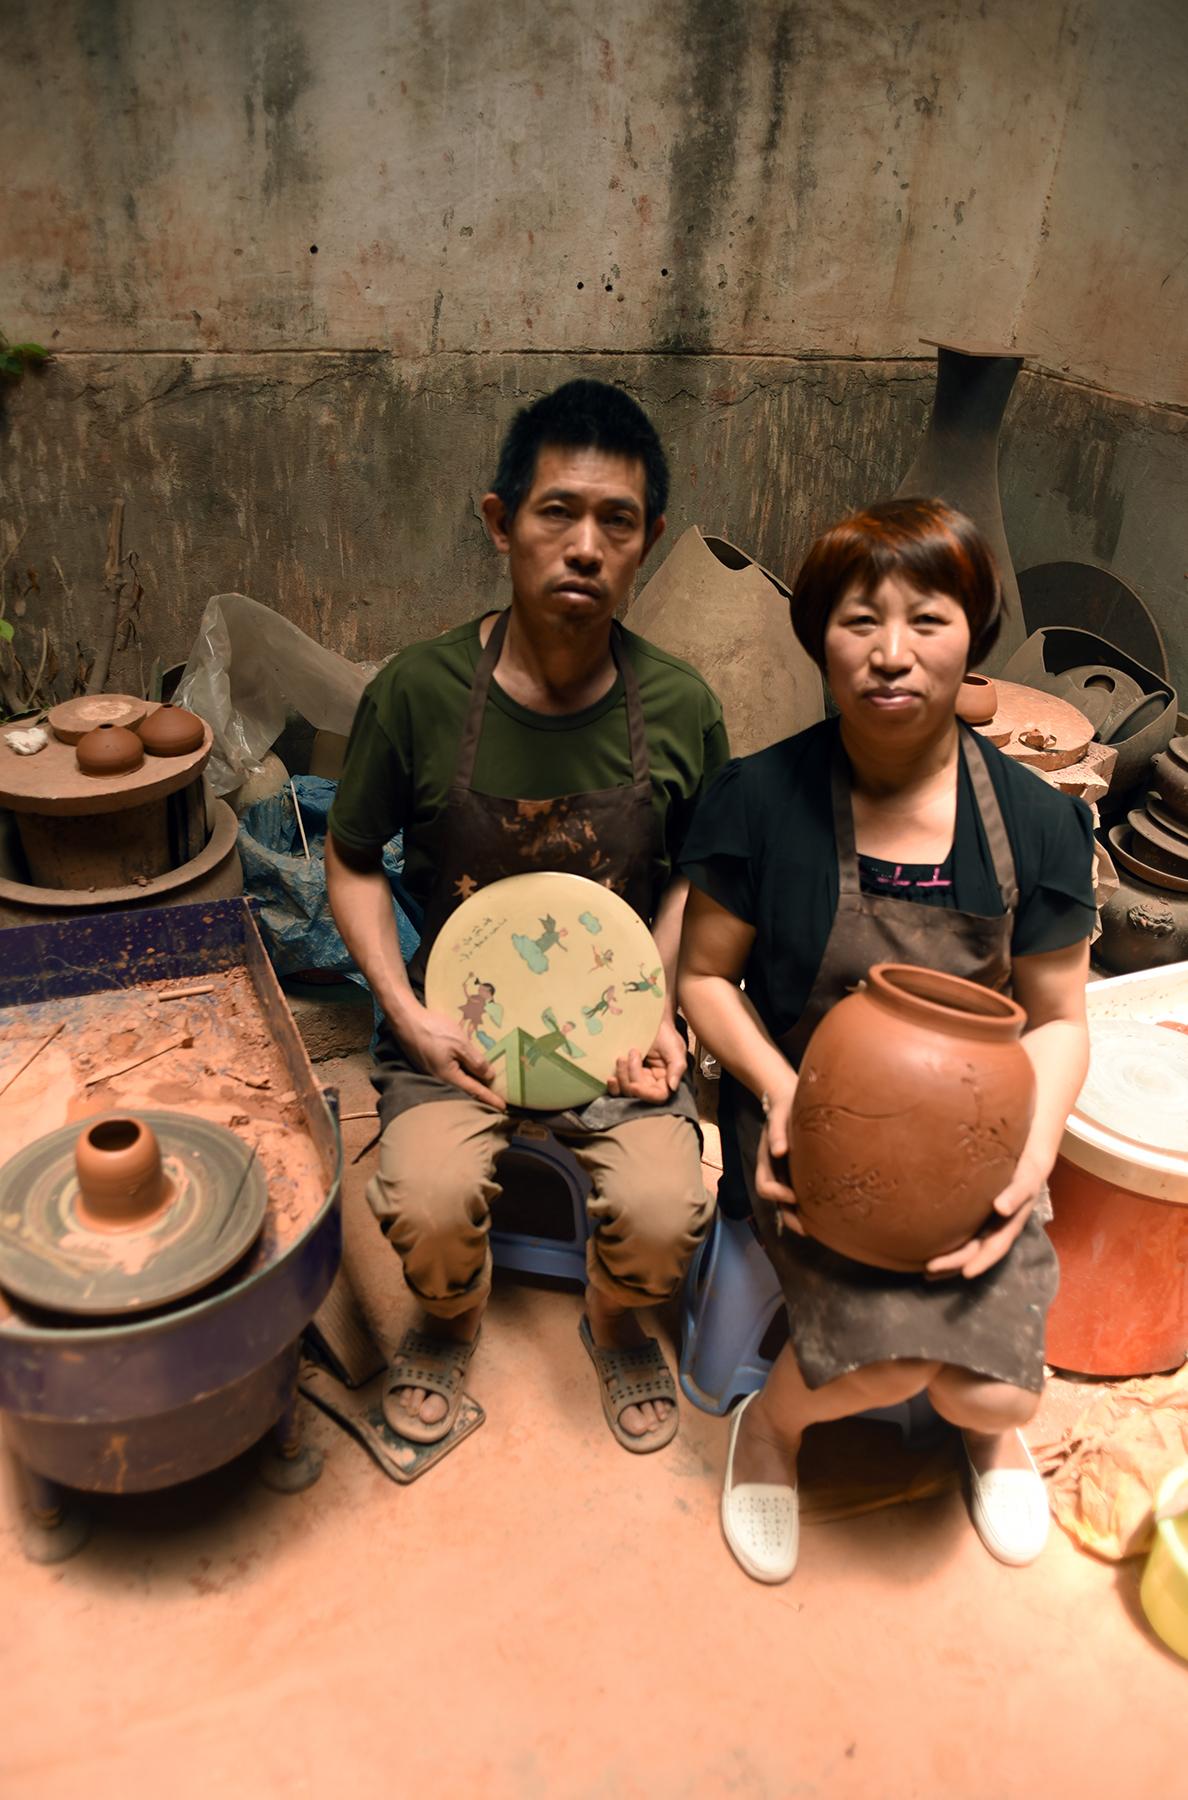 Mu Zhong and his wife Qing Fang,Inheritors of Purple Pottery Intangible Cultural Heritage, Jianshui, Yunnan Province.